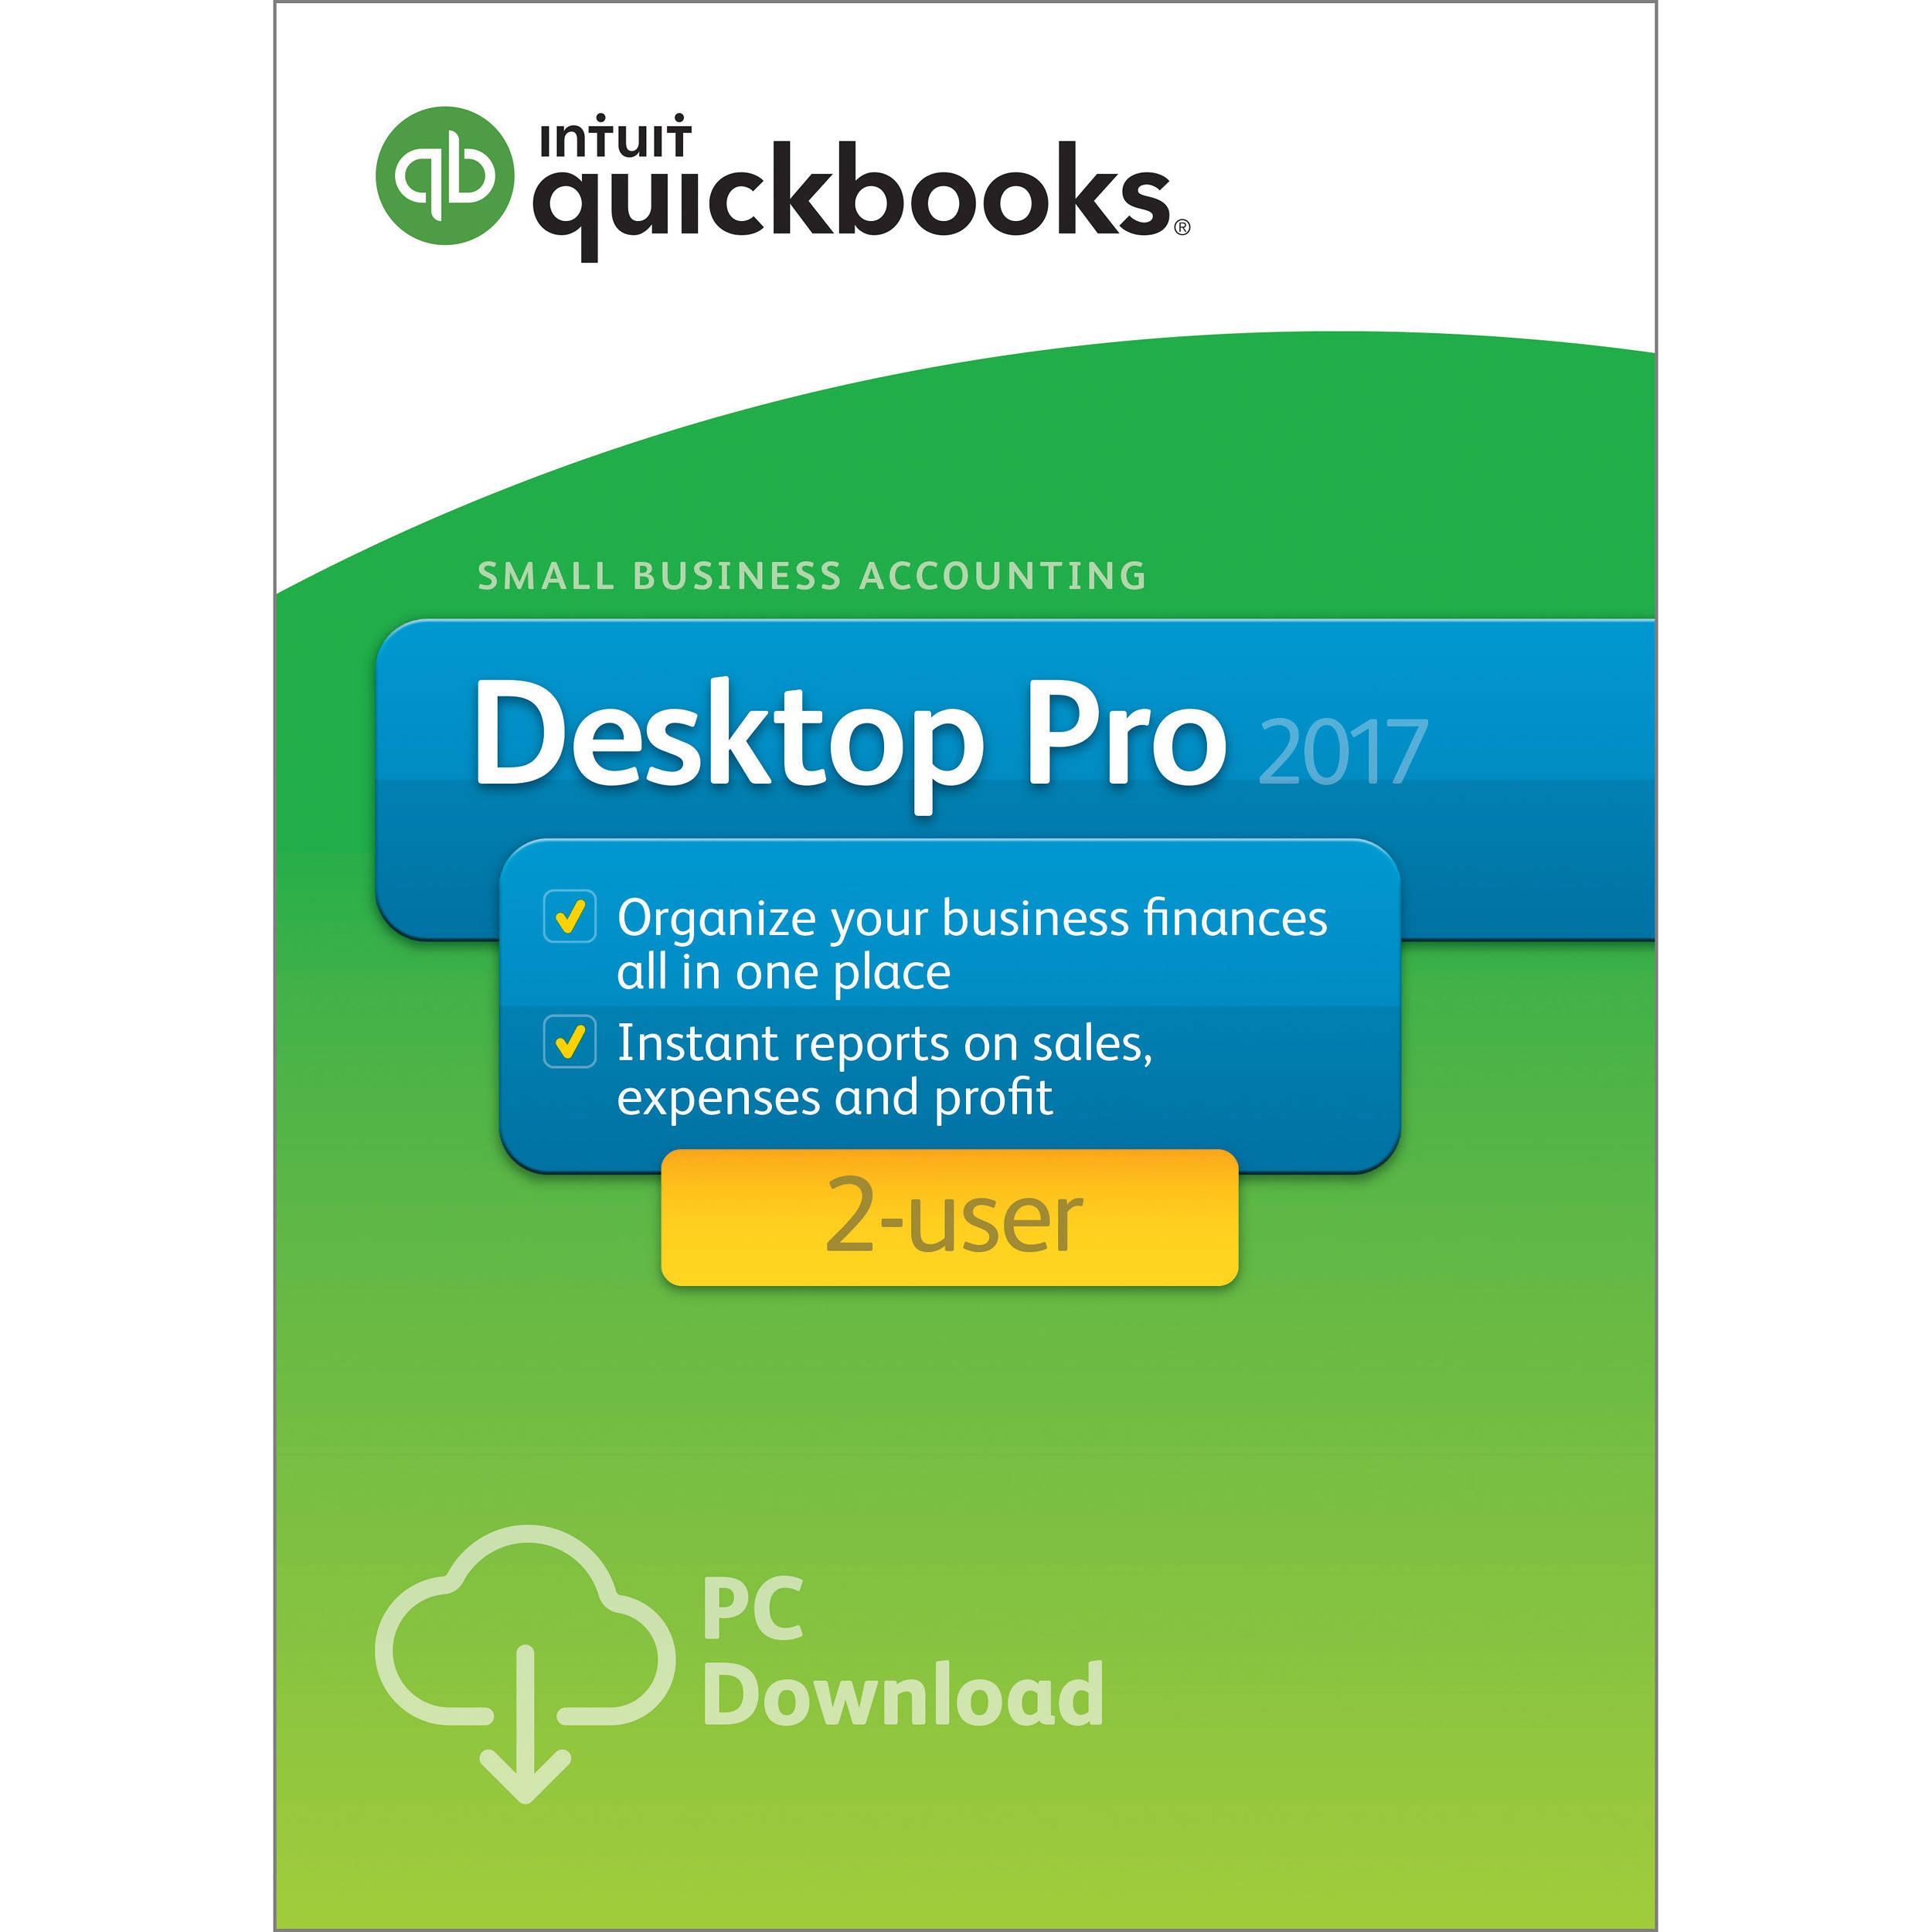 quickbooks pro 2017 update download